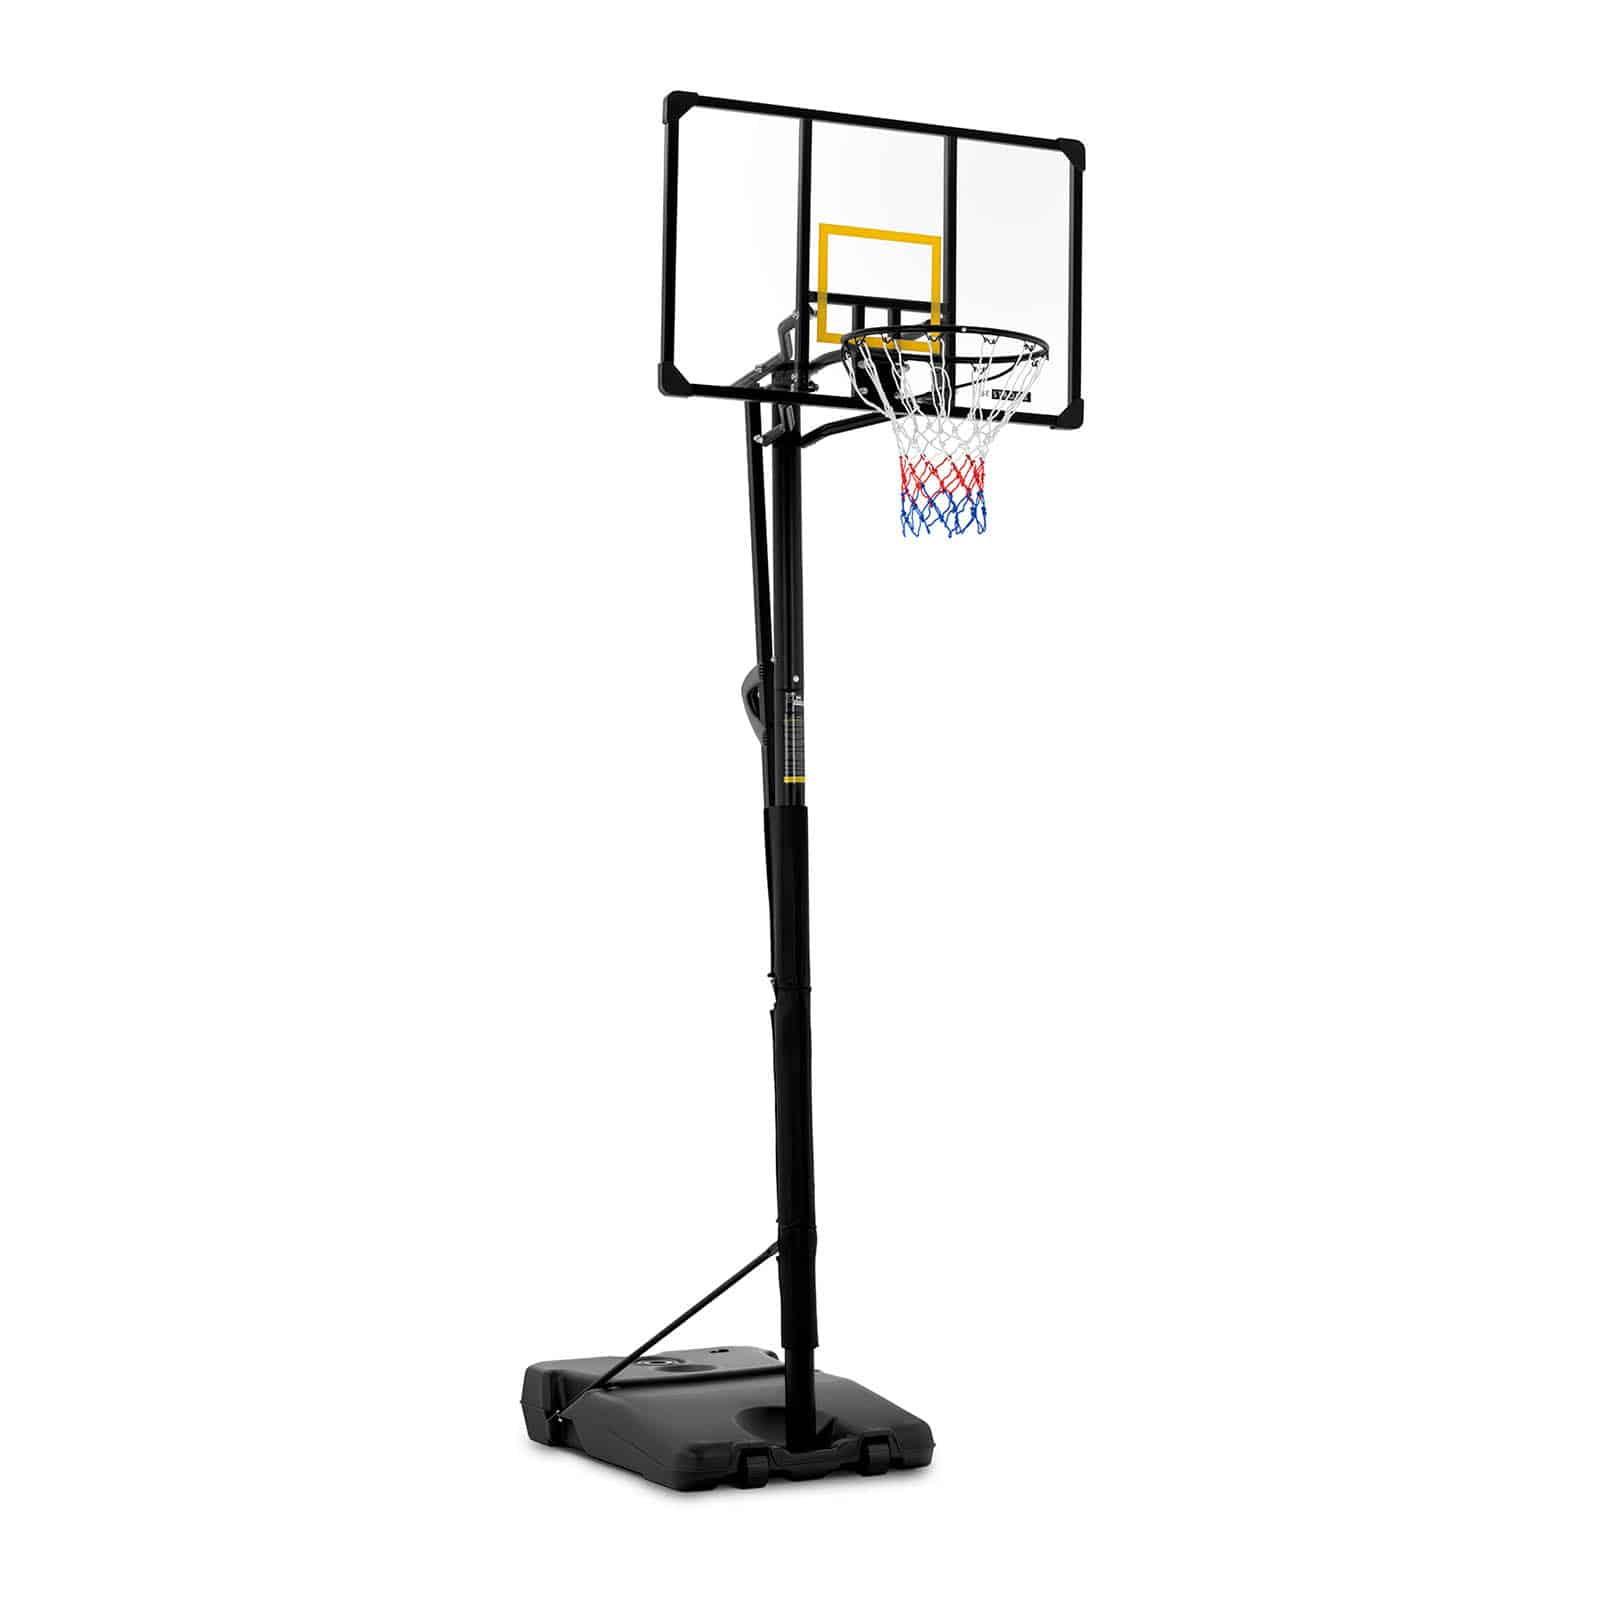 Basketkurve